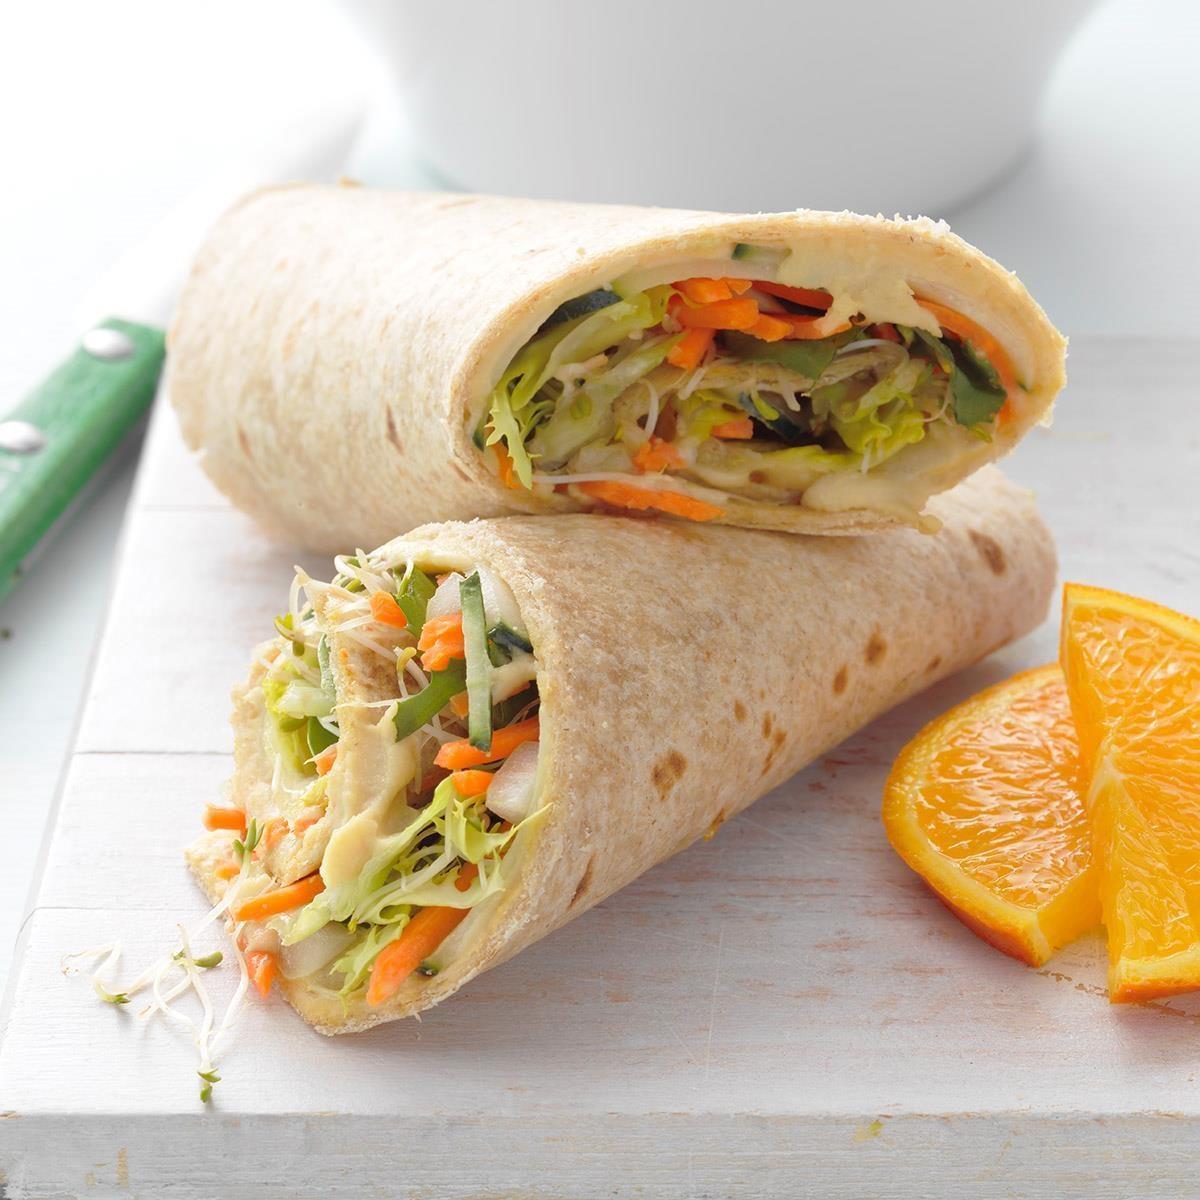 Hummus & Veggie Wrap-Up Recipe